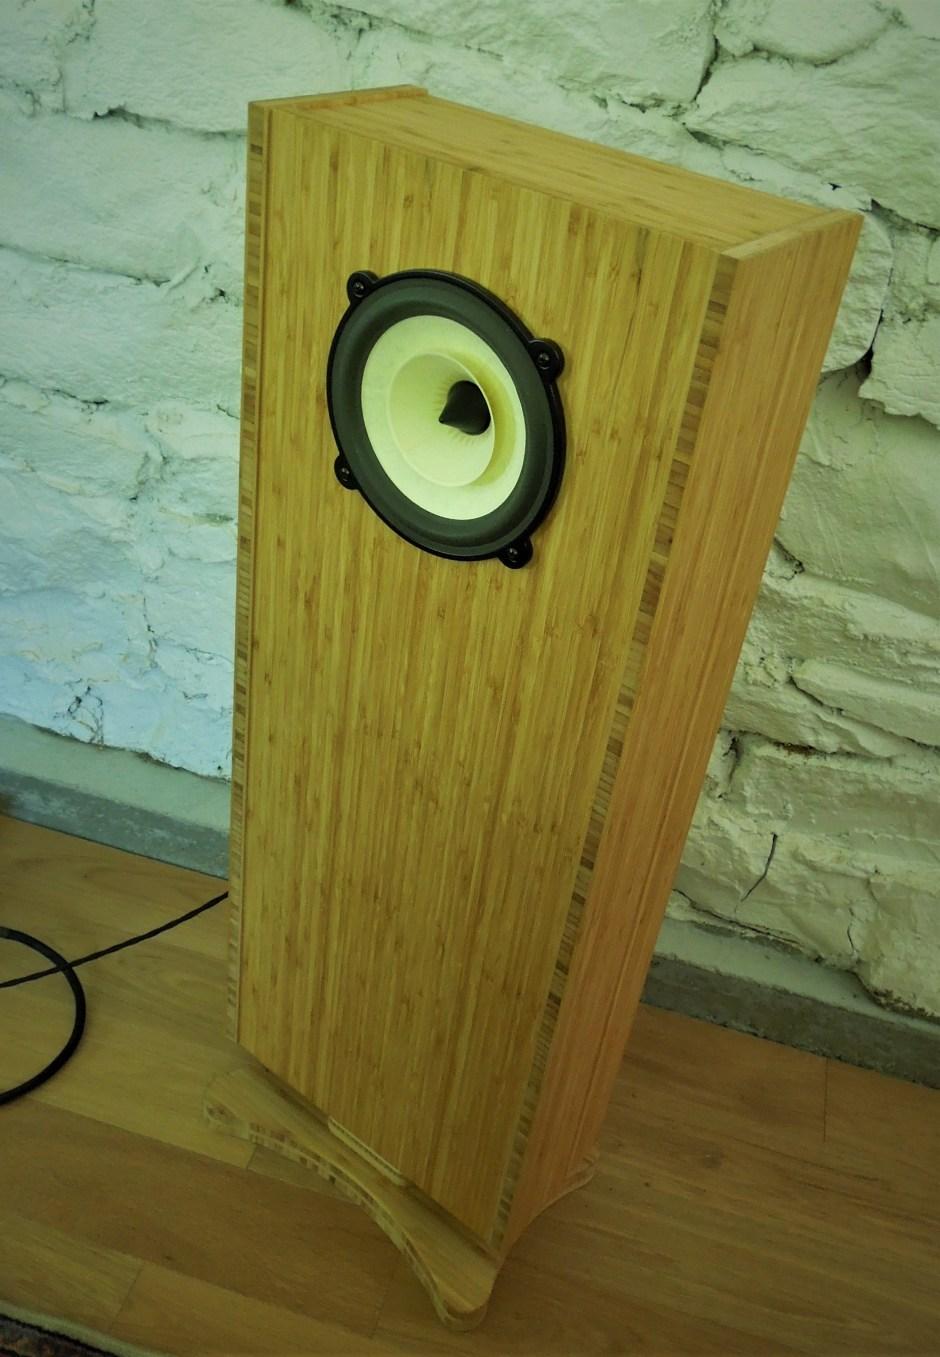 john richardson reviews the charney audio maestro